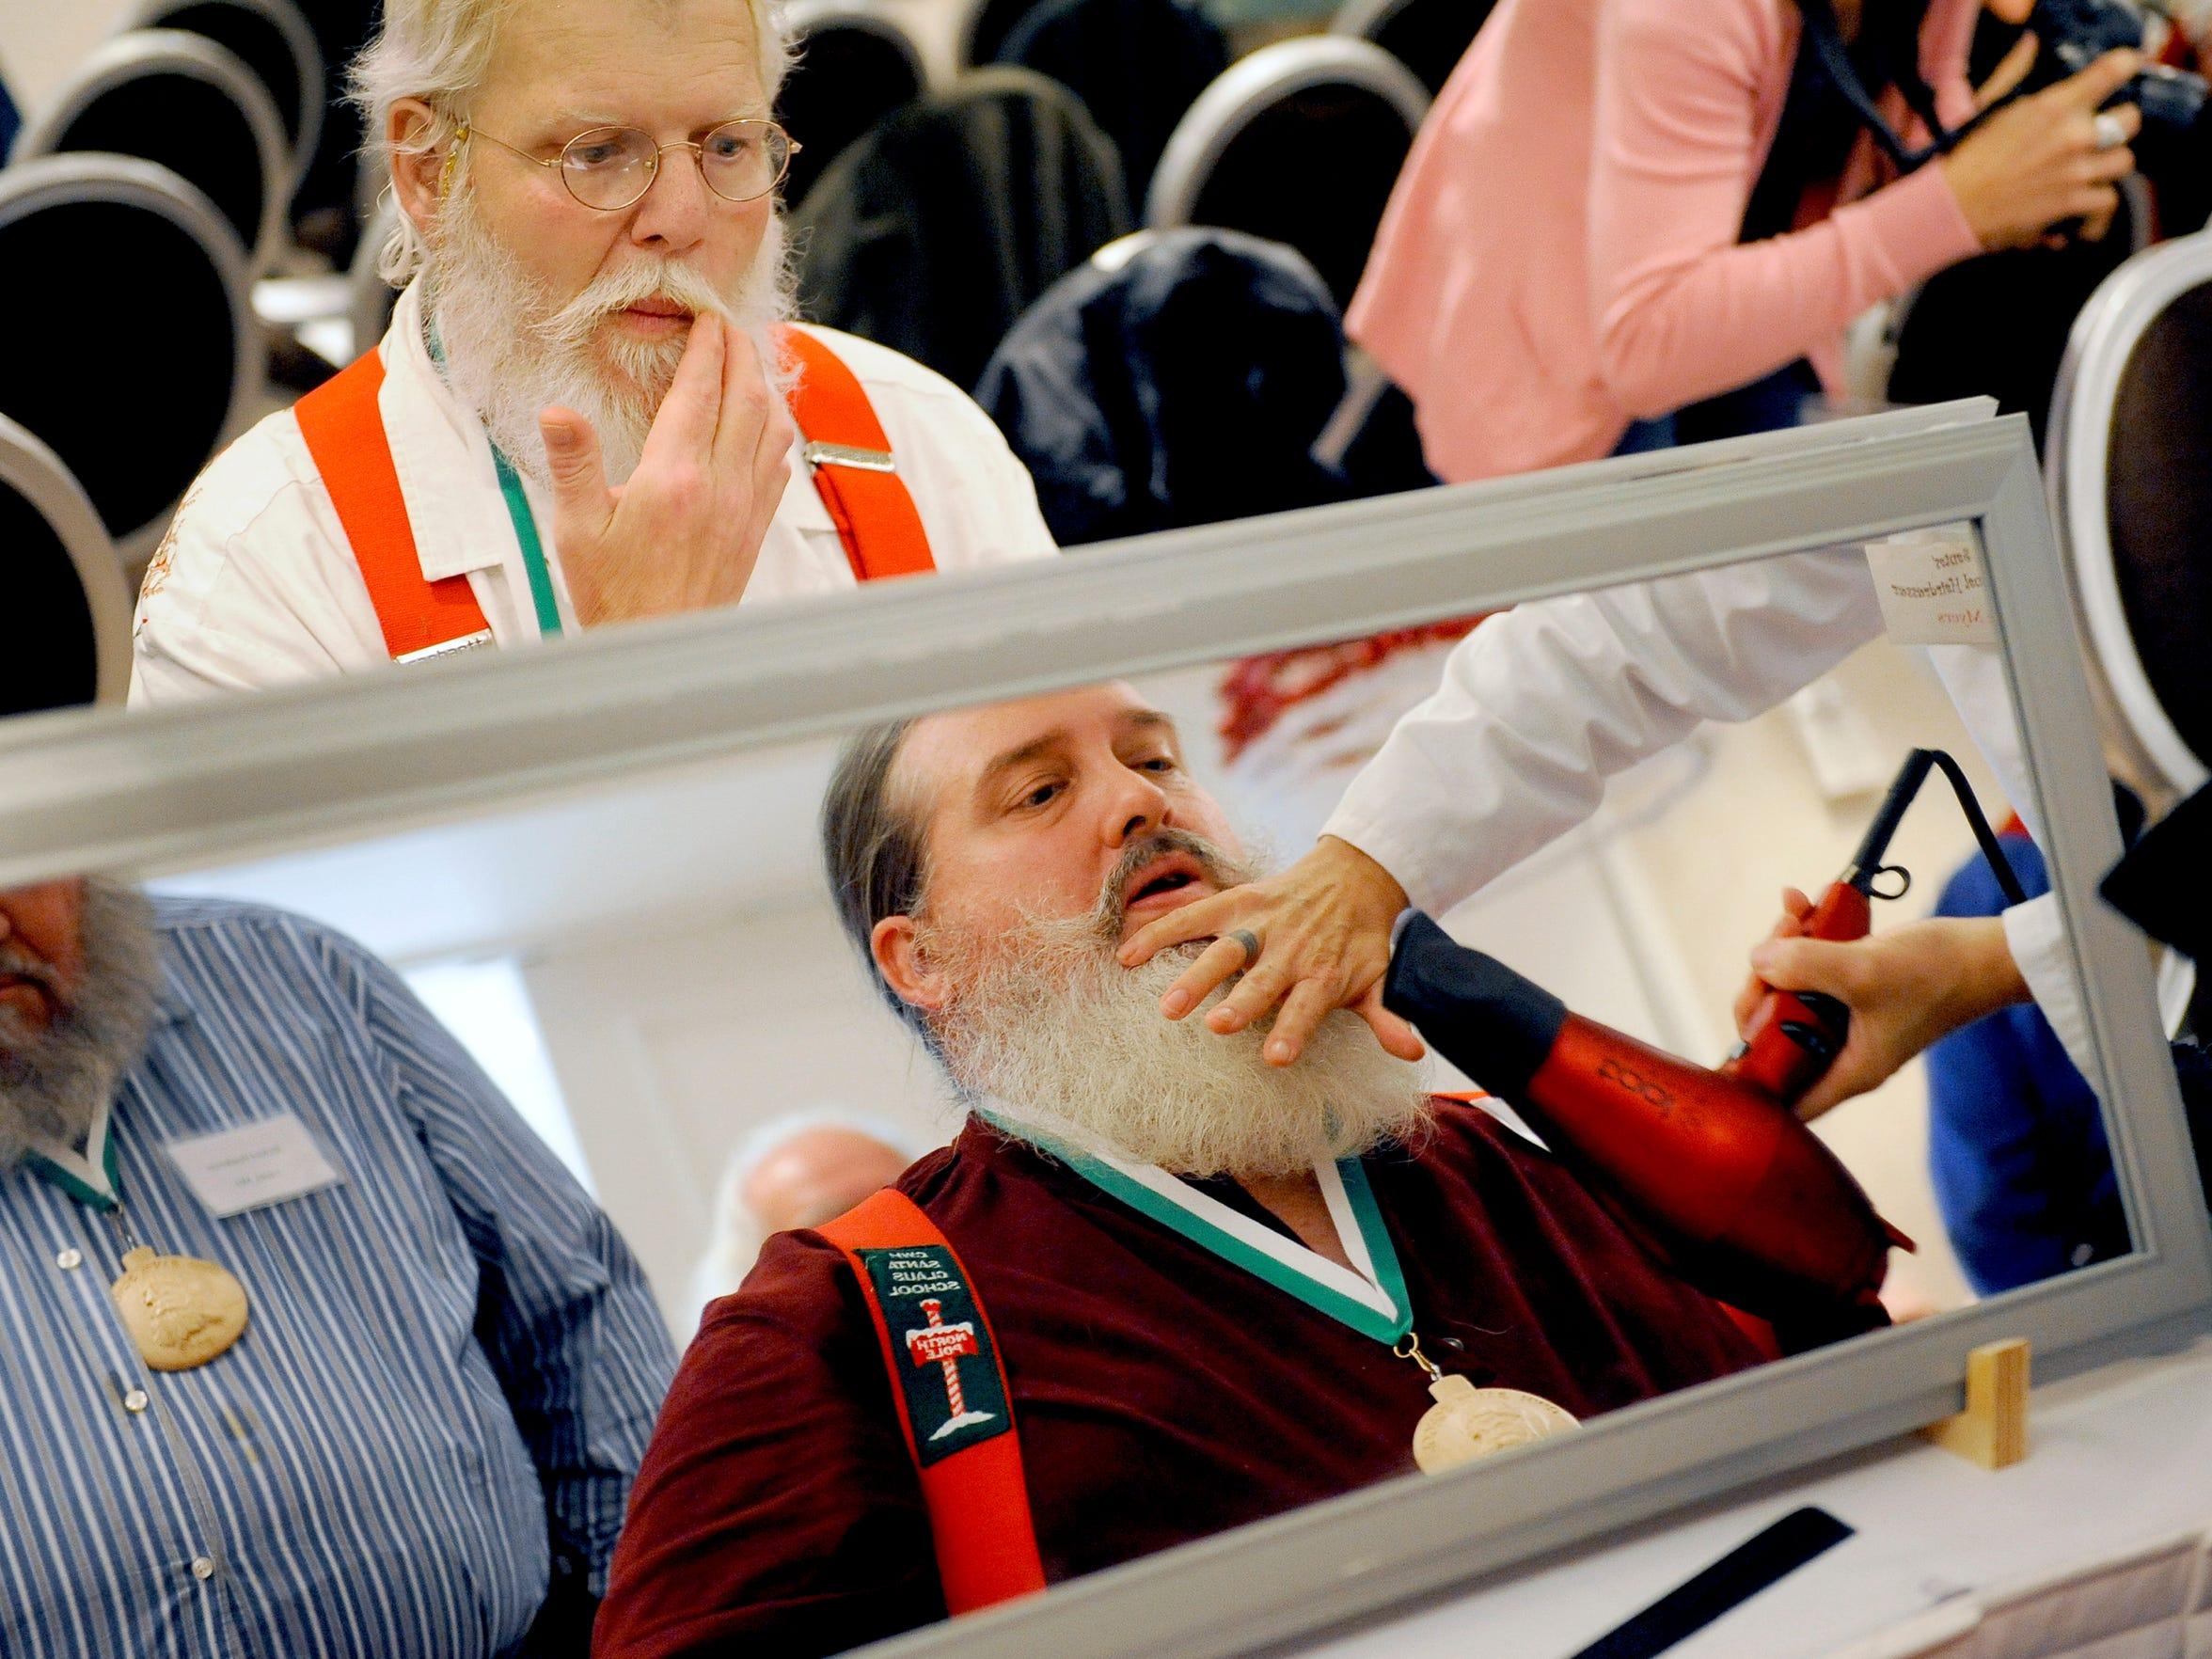 Santas get grooming tips and beard work at the Santa Claus School in Midland. Established.